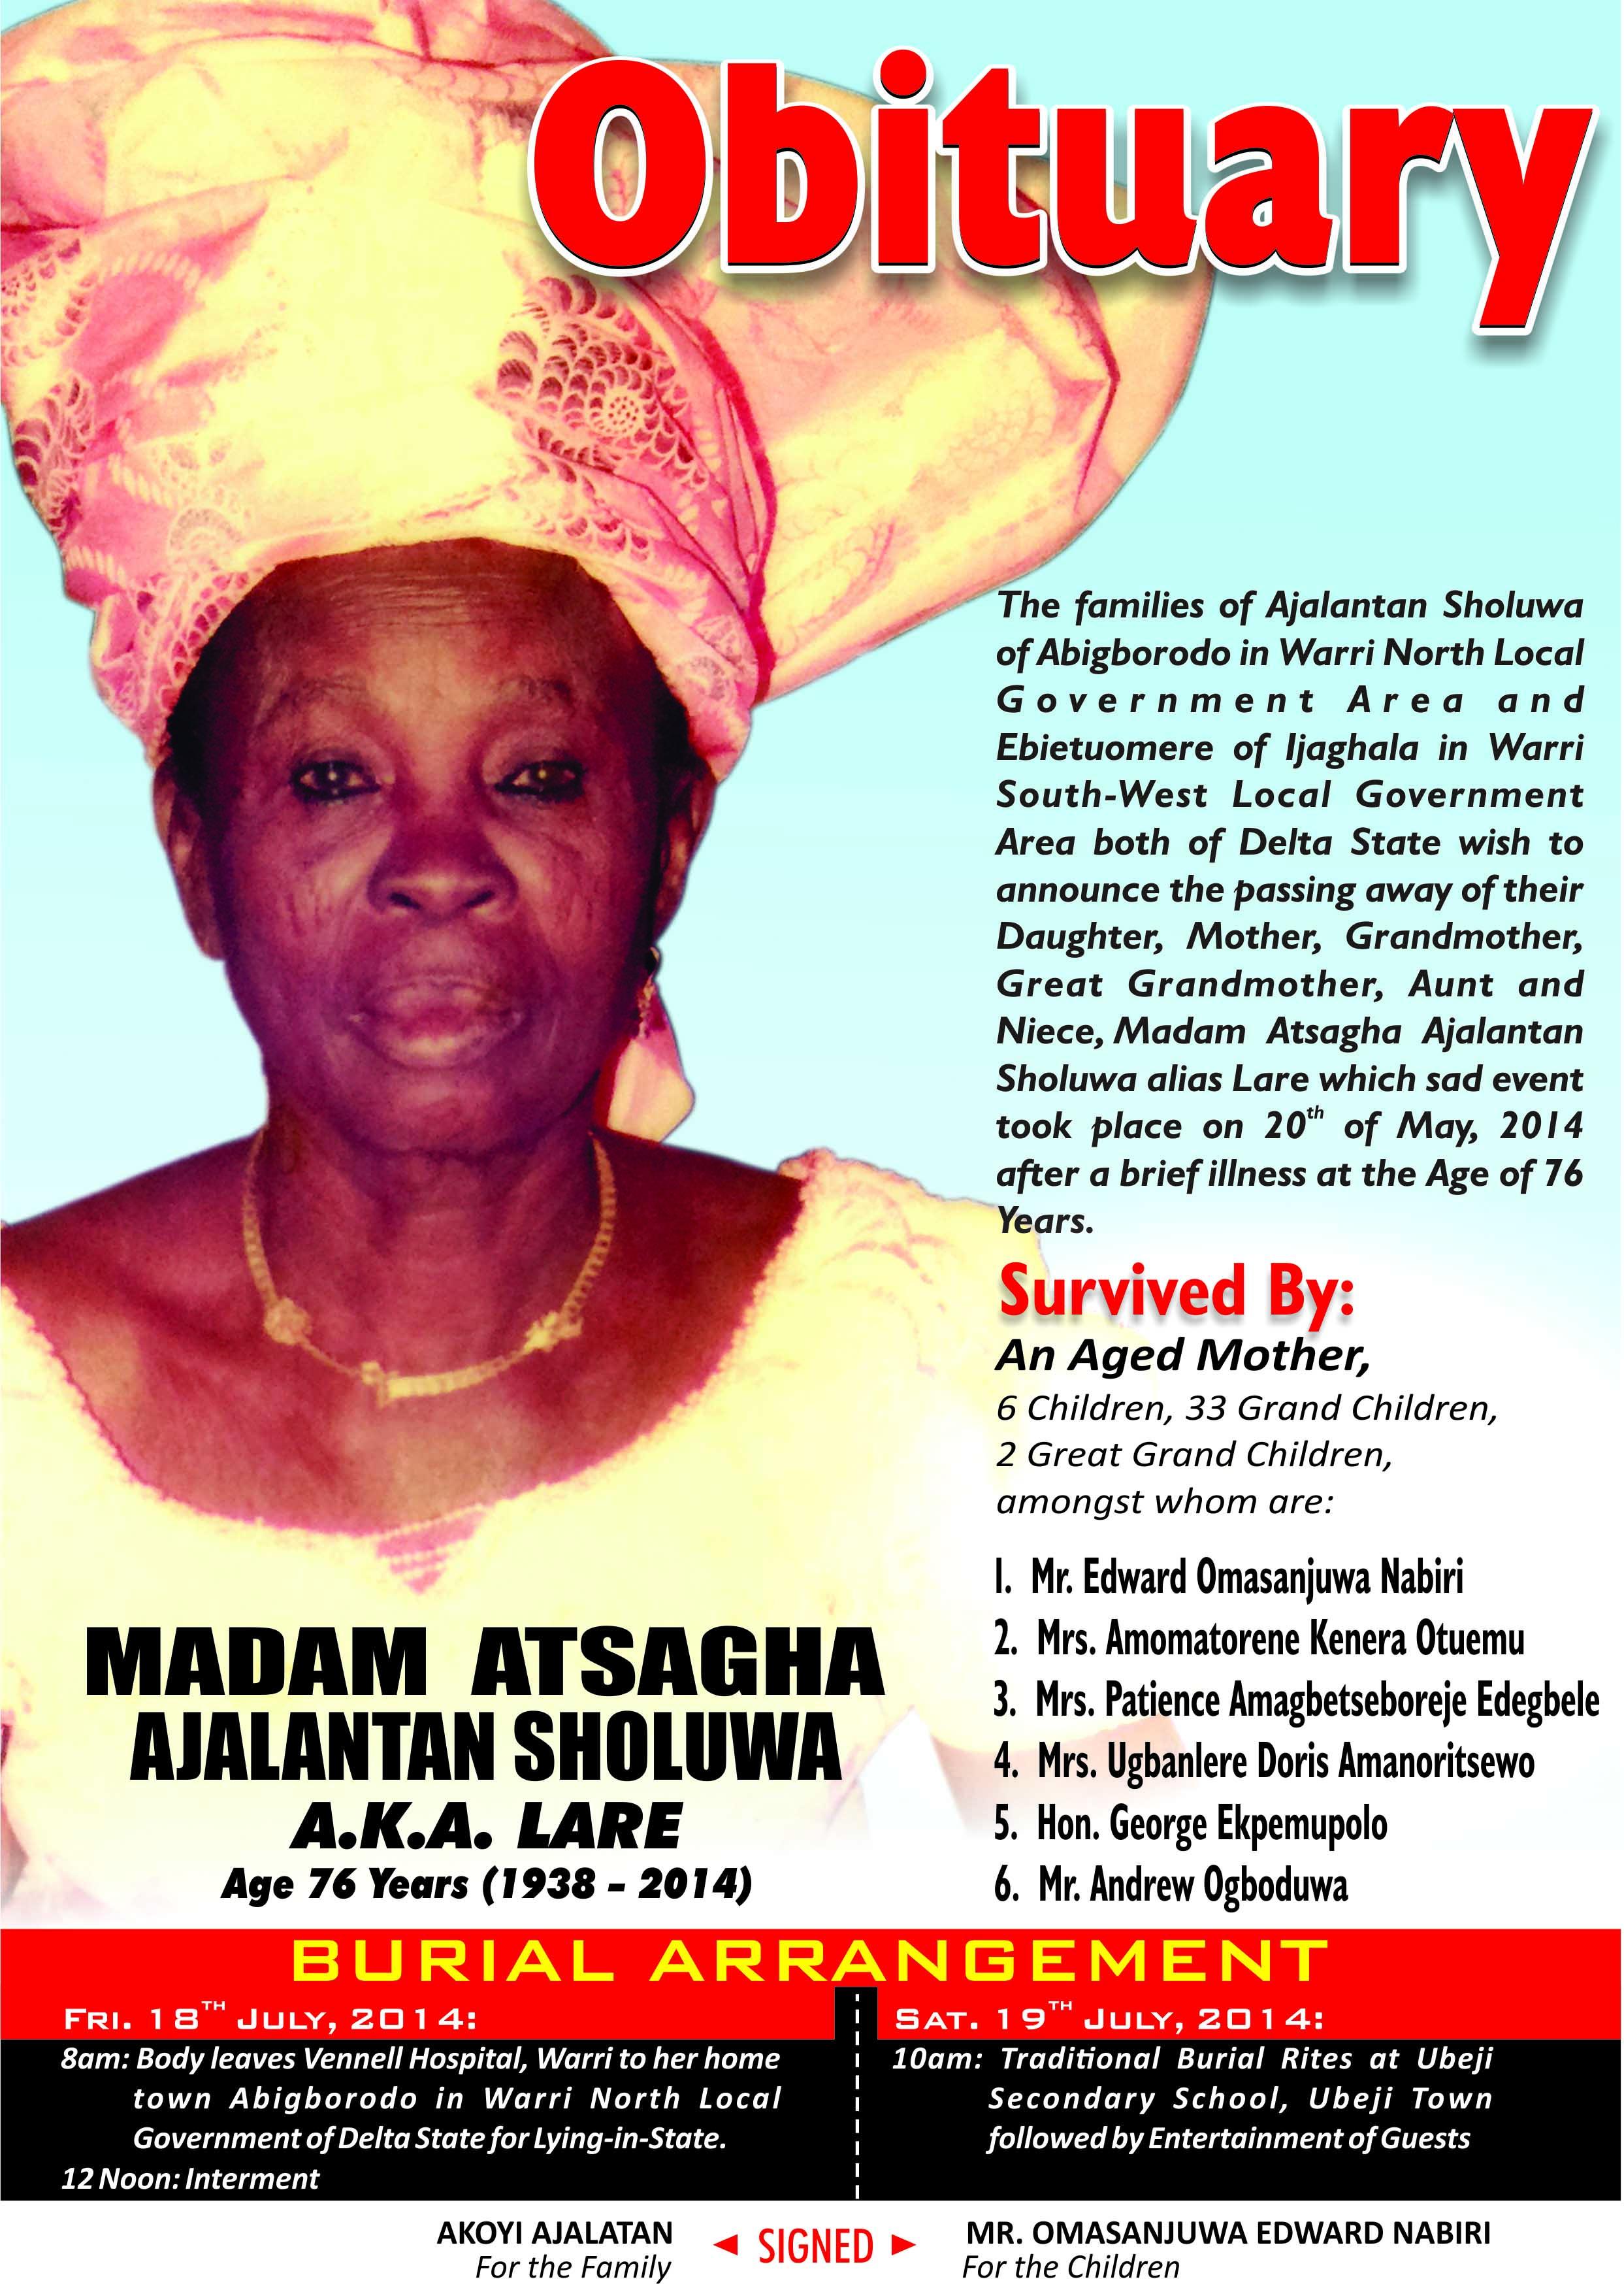 OBITUARY: MADAM ATSAGHA AJALANTAN SHOLUWA FOR BURIAL, JULY 18 &19 ...